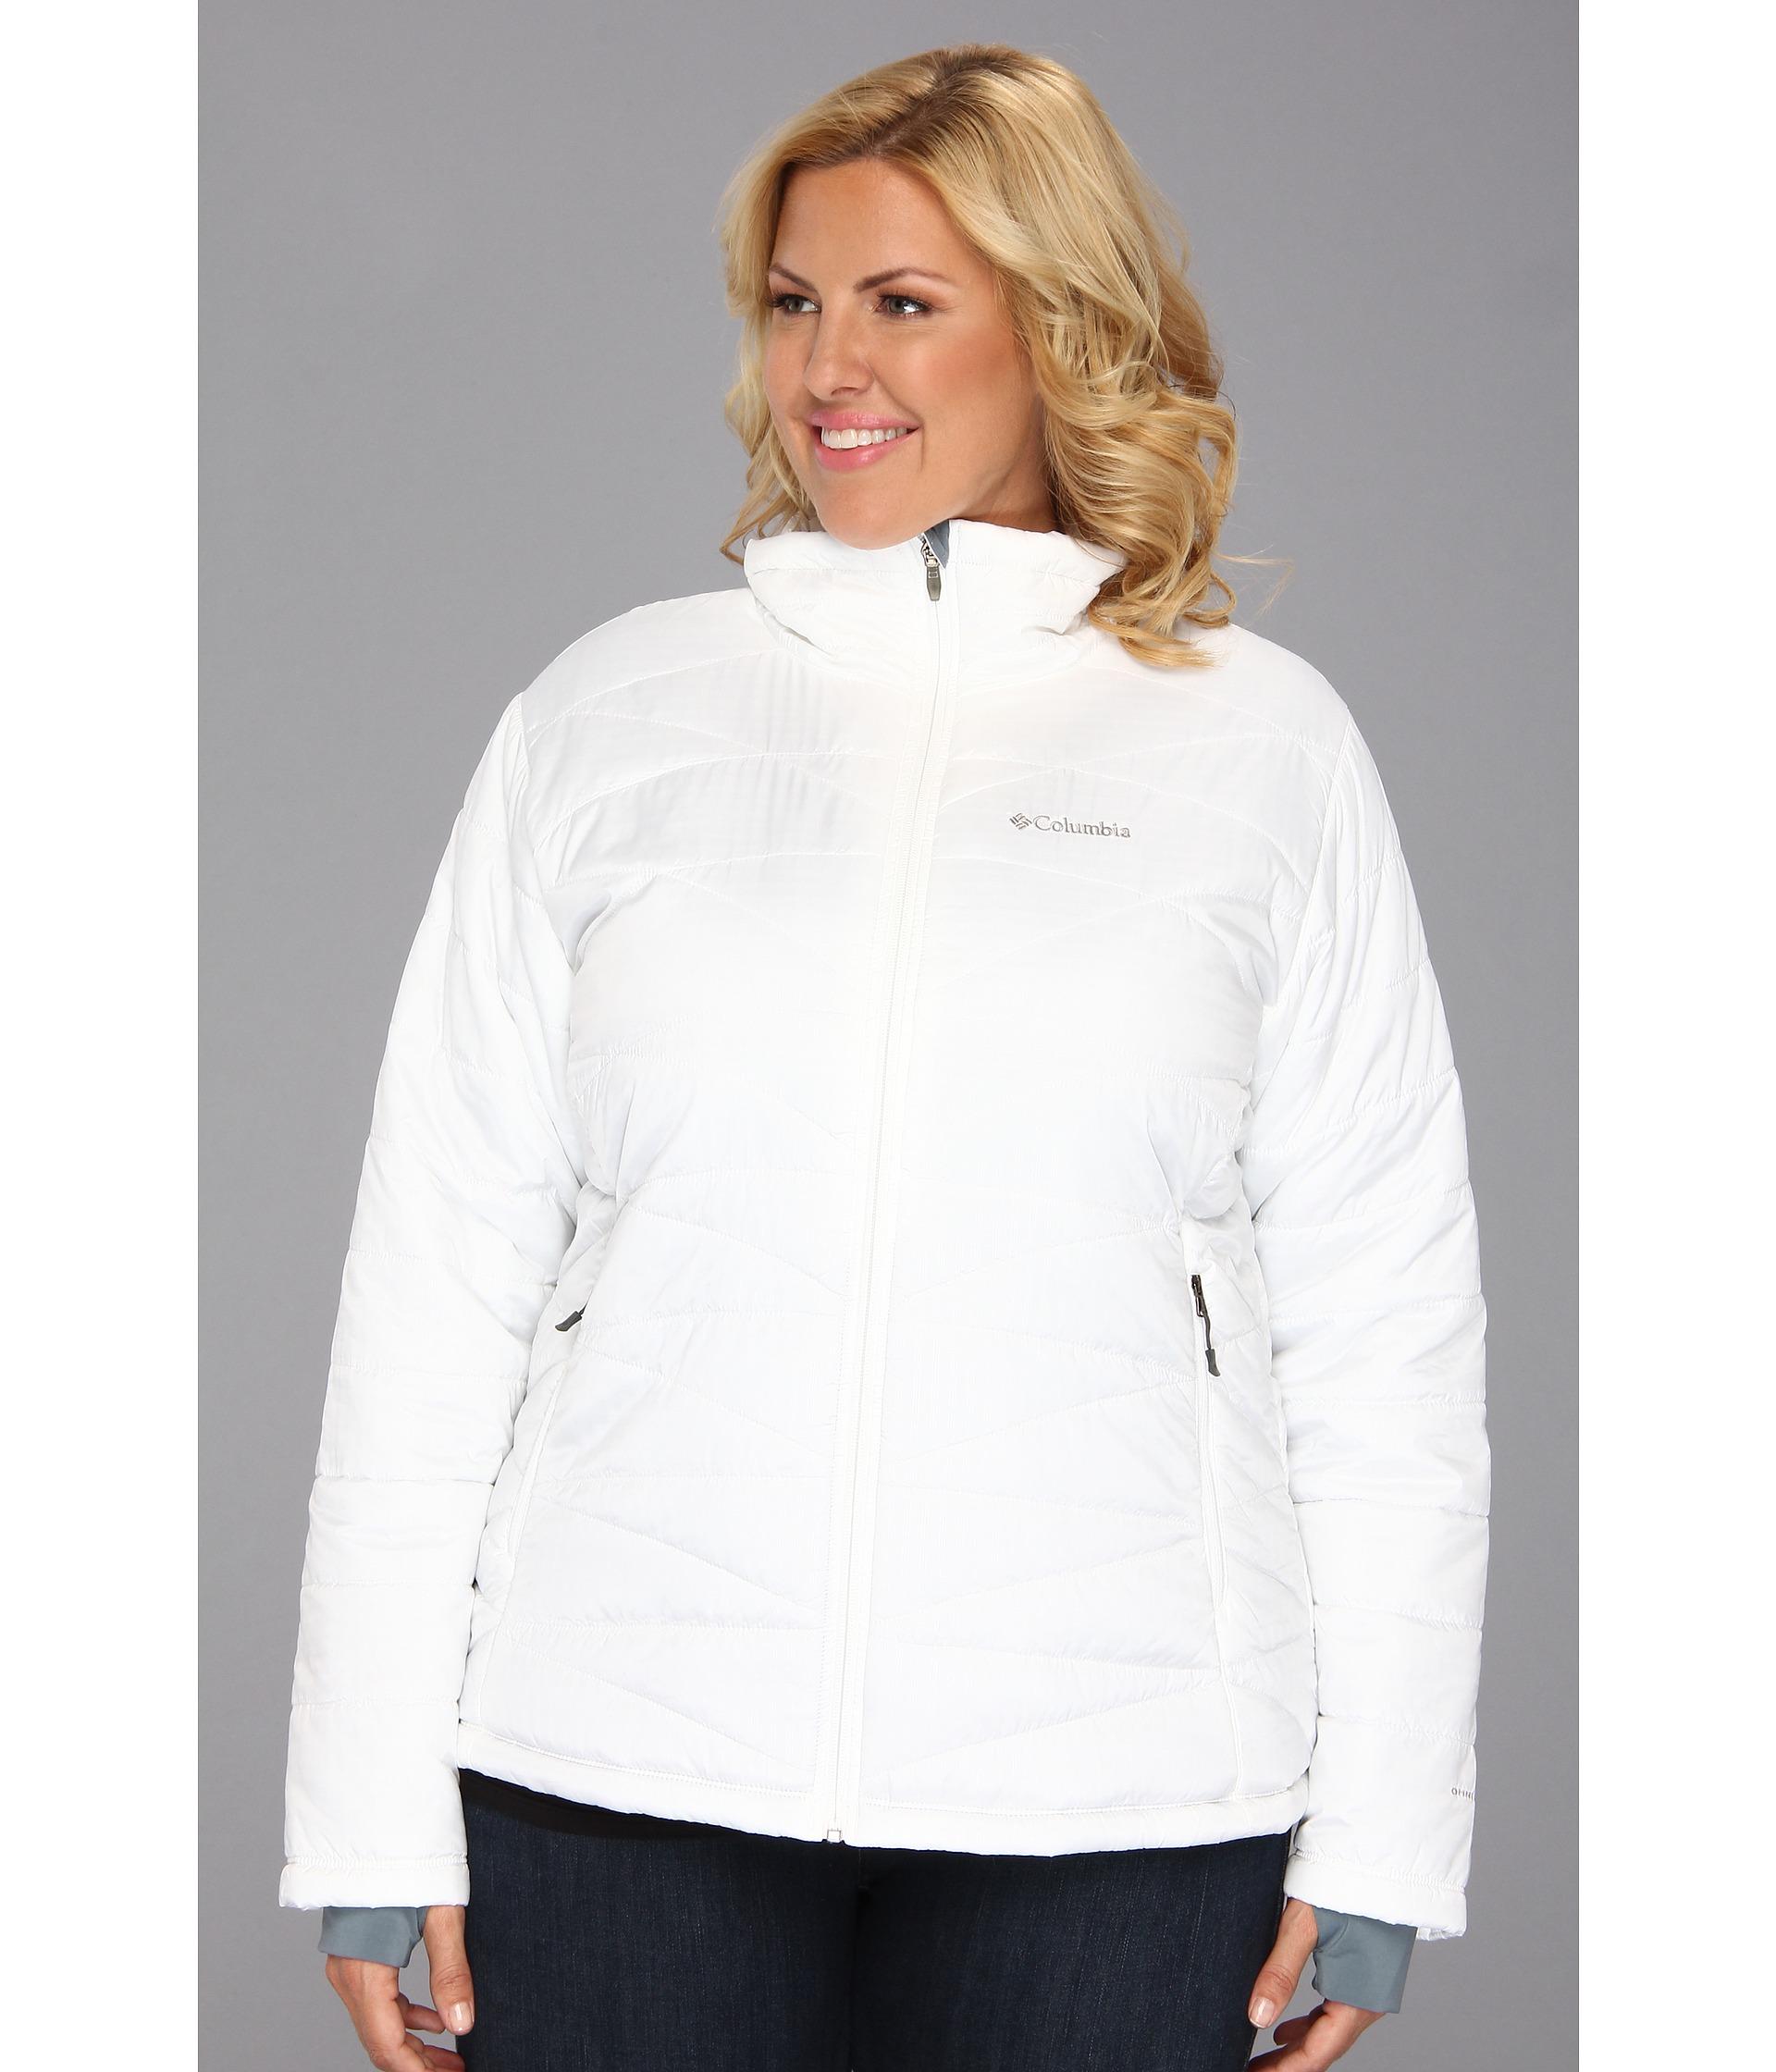 Columbia winter coats for women plus size